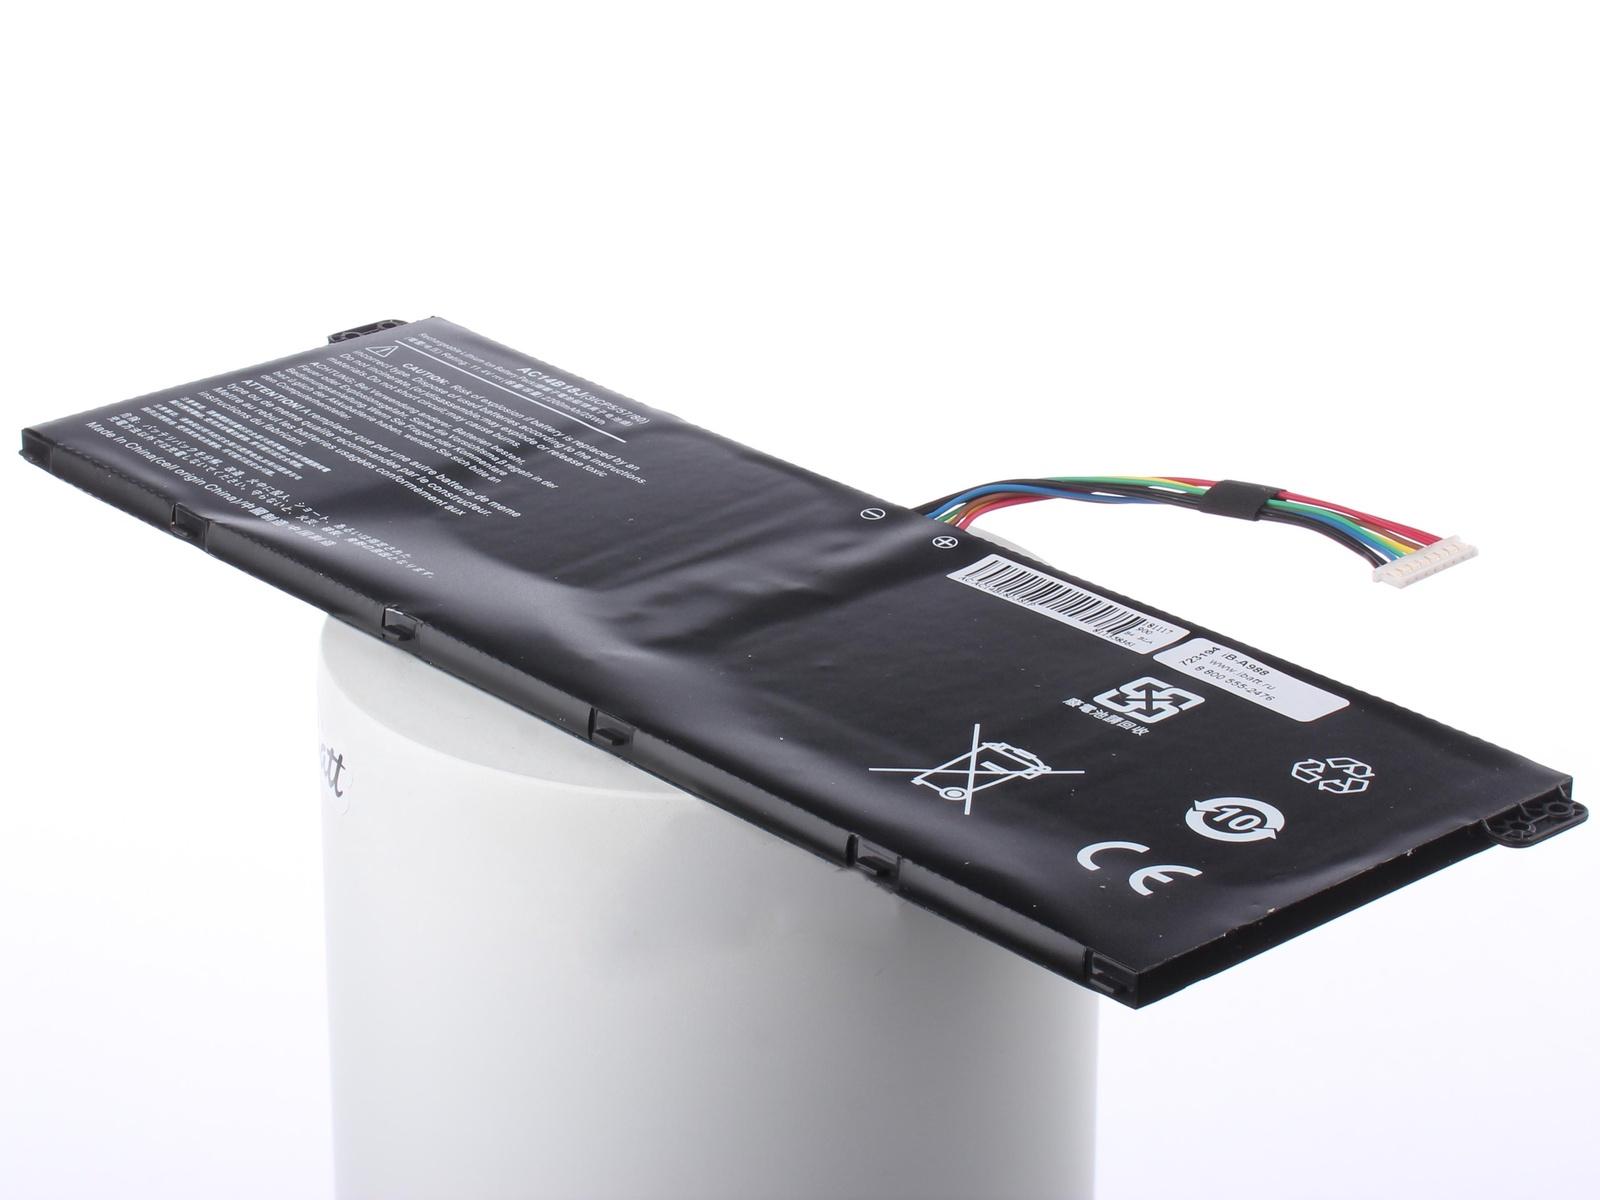 цены на Аккумуляторная батарея iBatt iB-T8-A988 3220mAh для ноутбуков Acer, Packard Bell  в интернет-магазинах